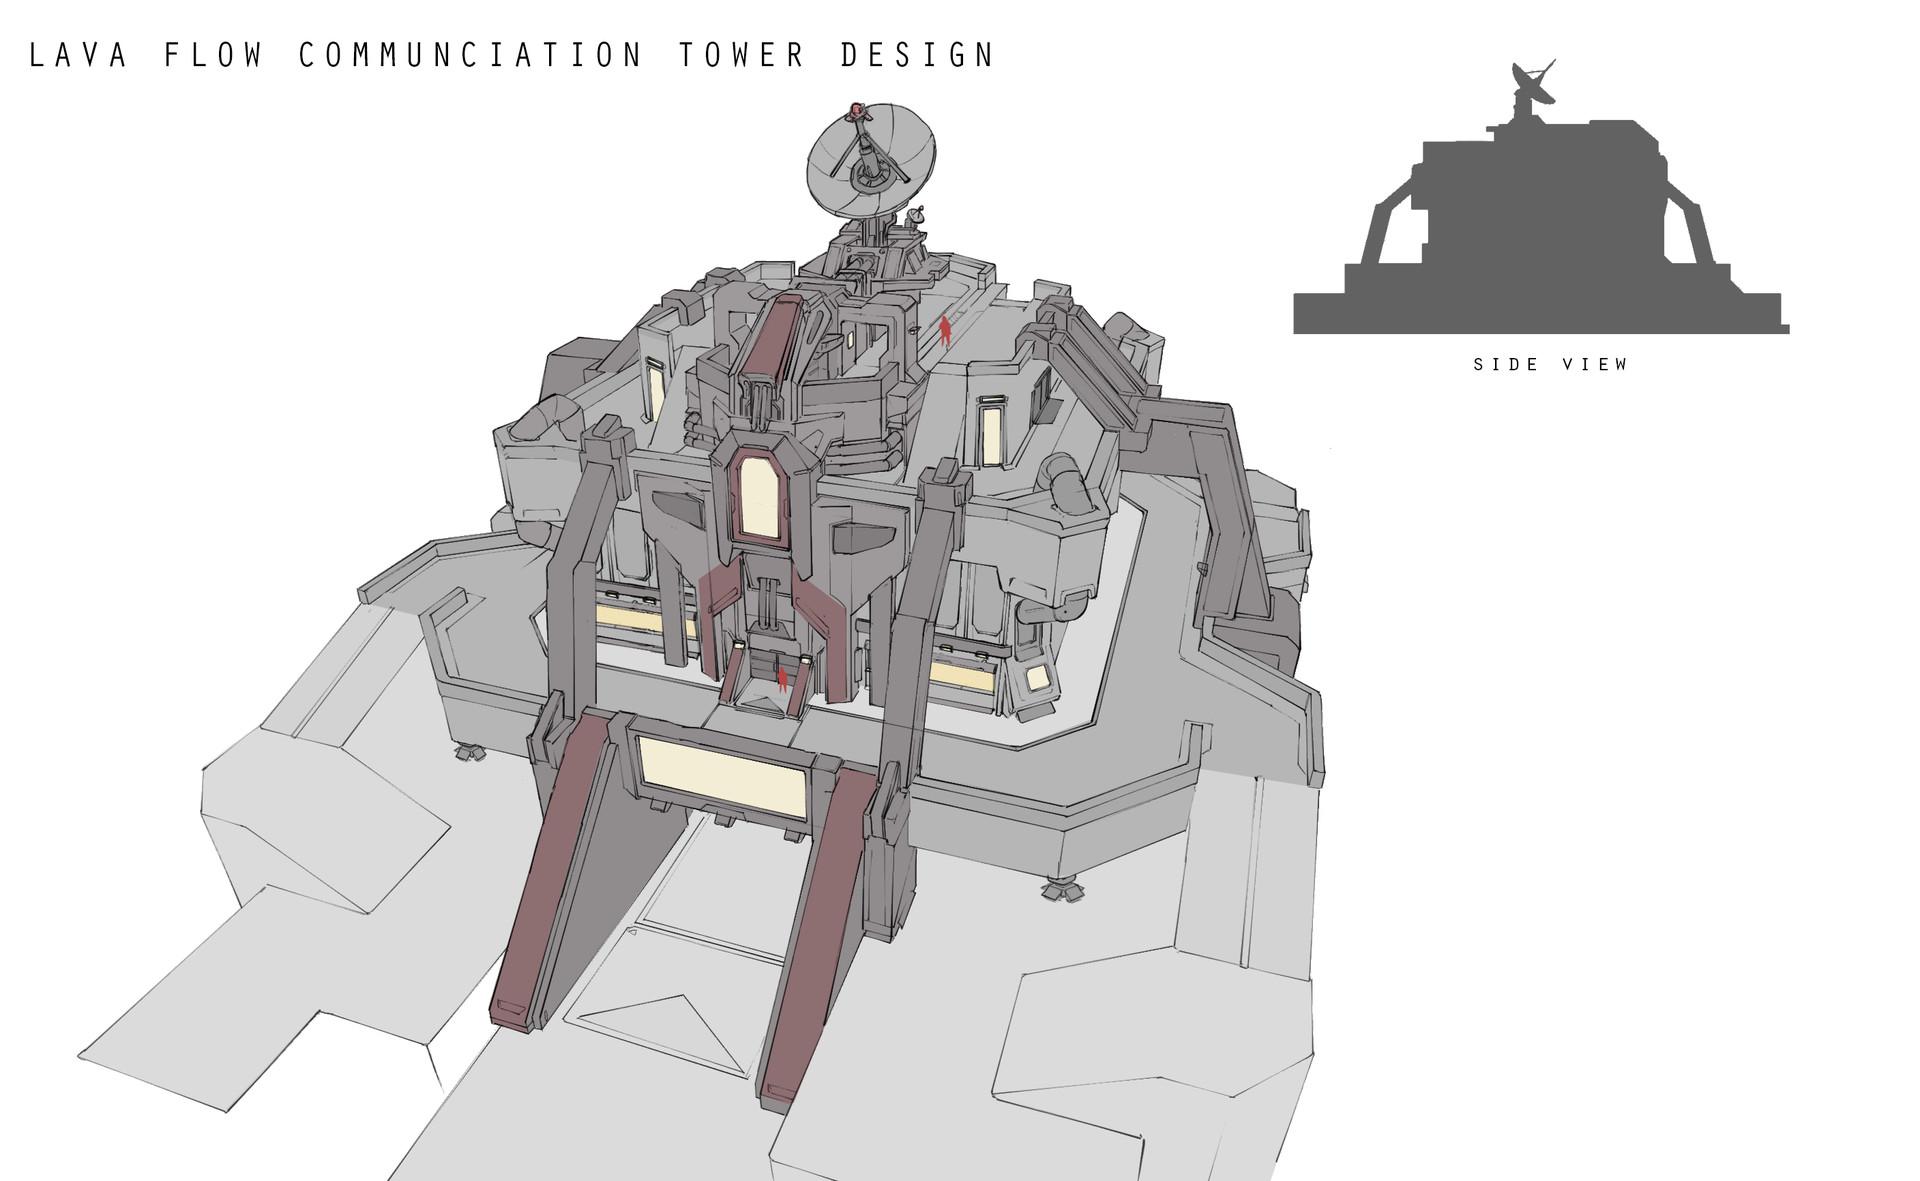 Franklin chan lava flow comm tower design layout